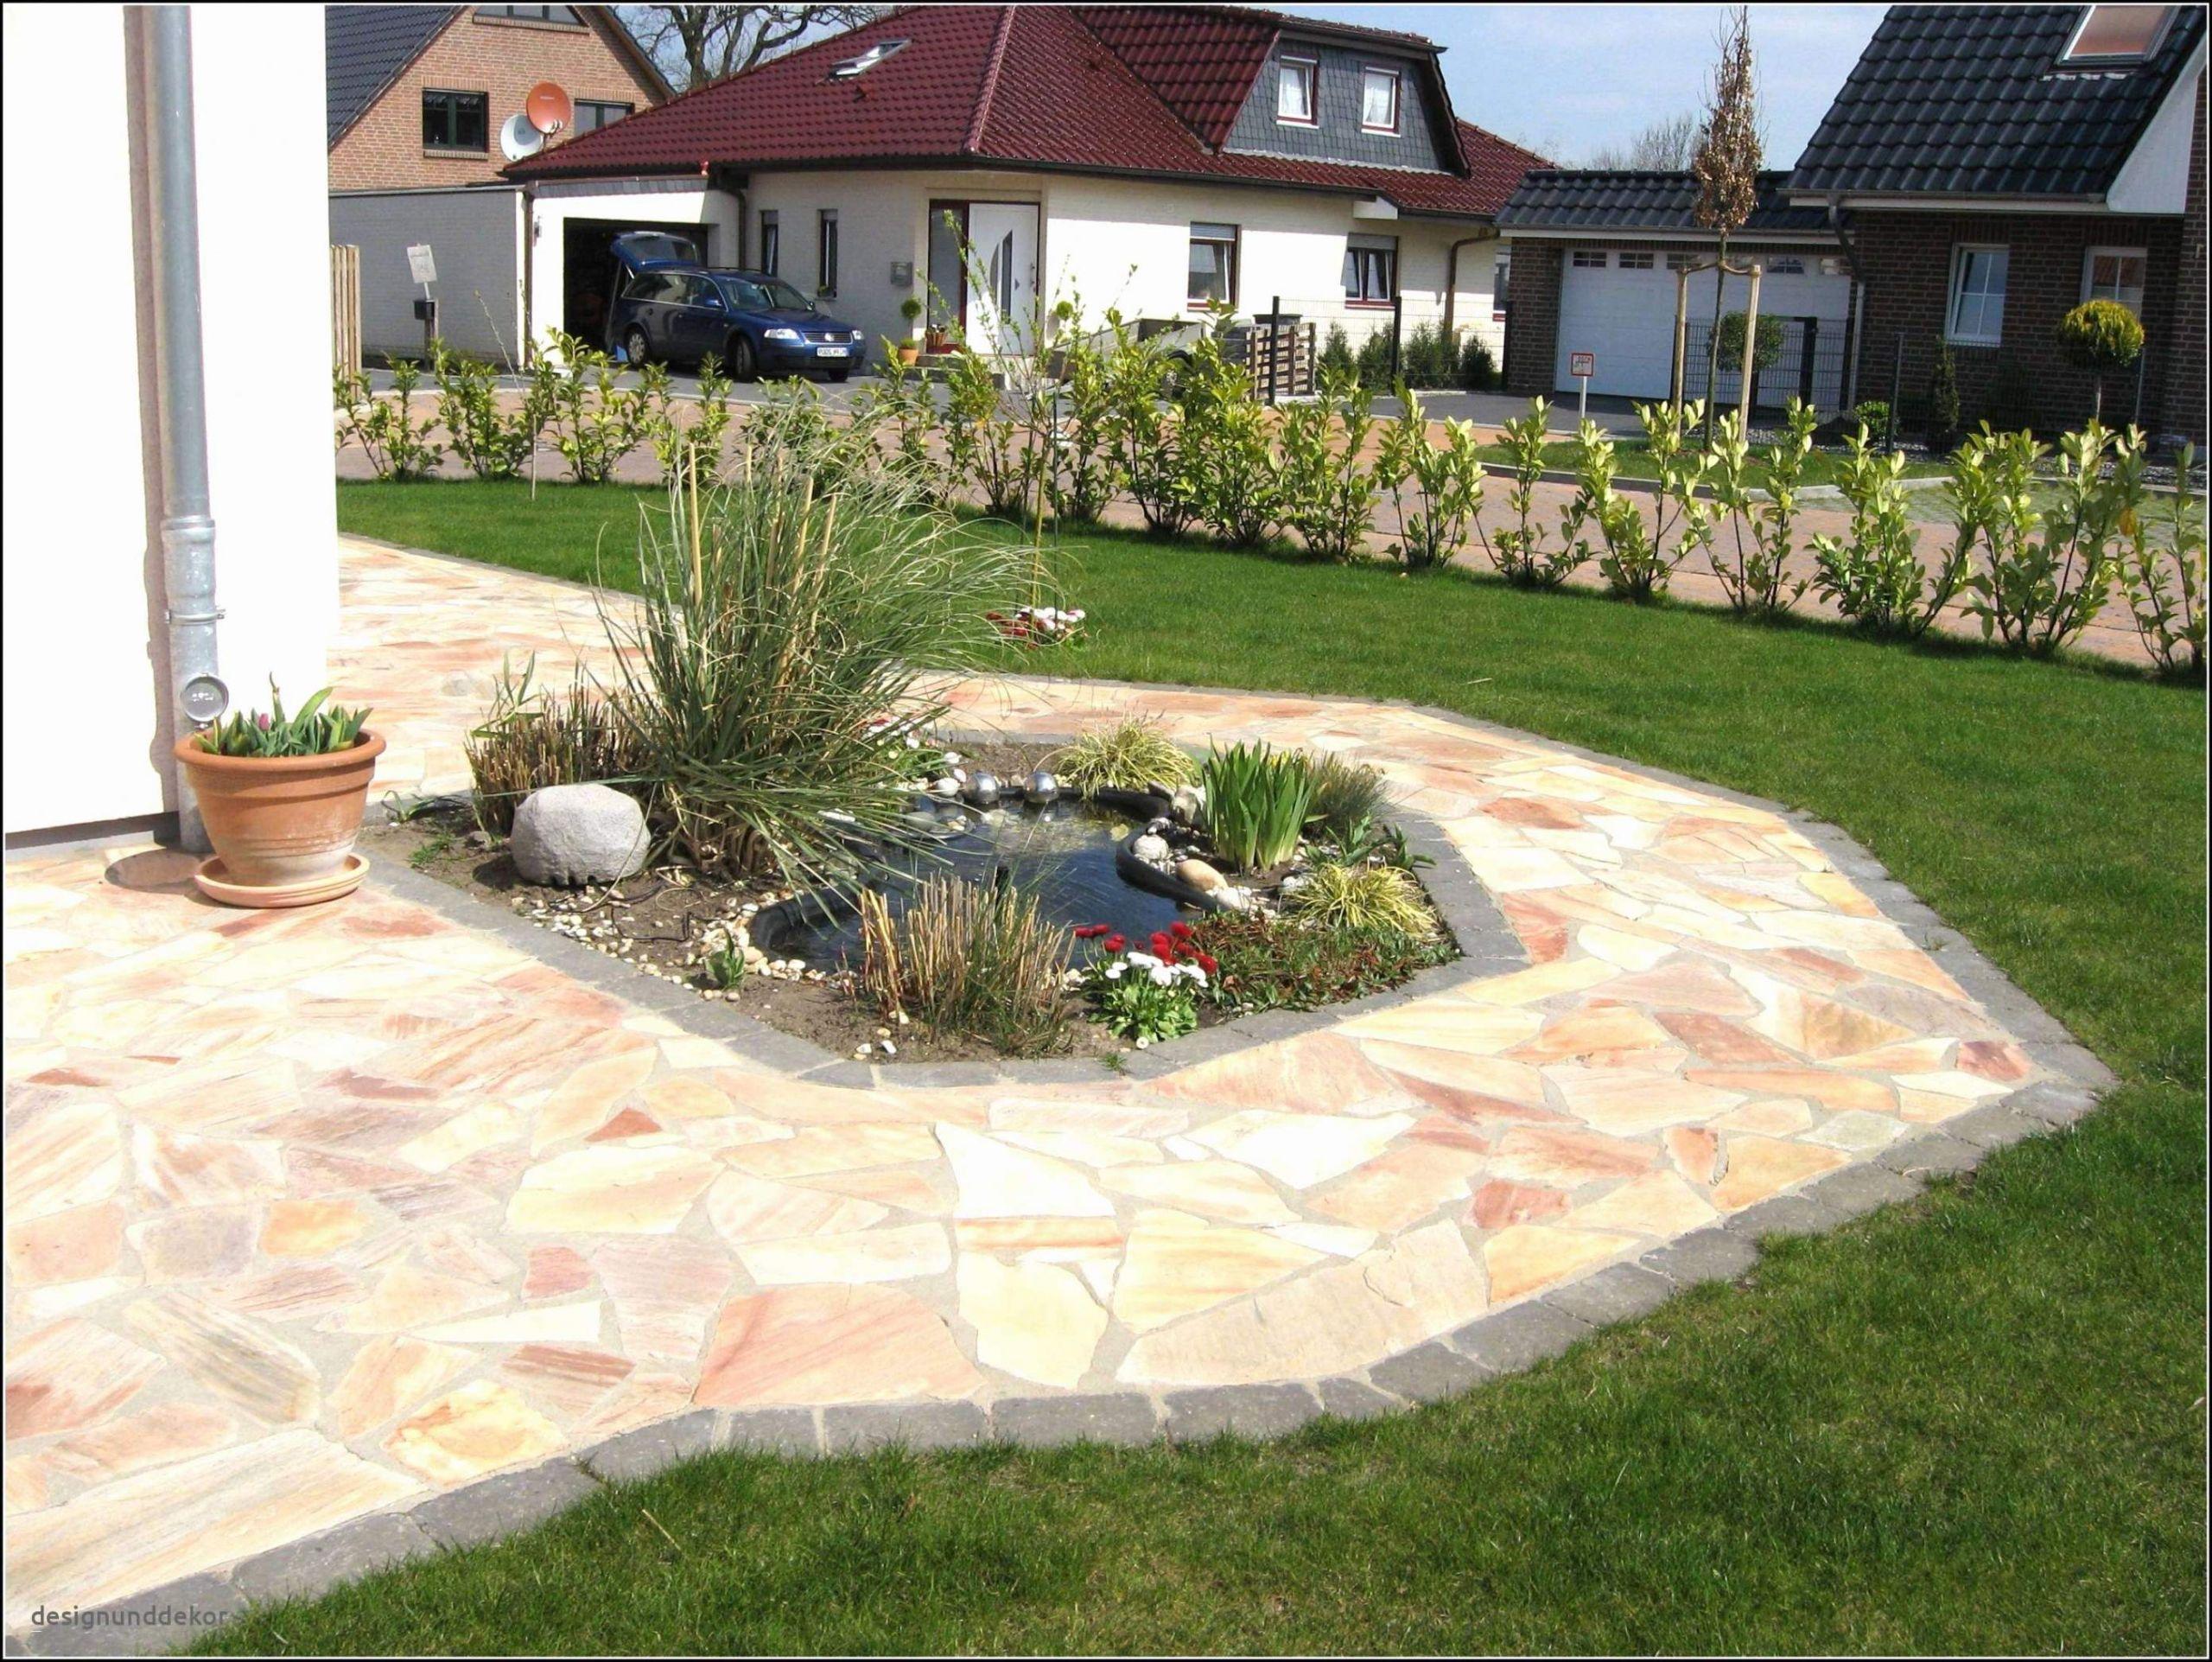 Sondernutzungsrecht Garten Frisch Garten Gestalten Ideen — Temobardz Home Blog